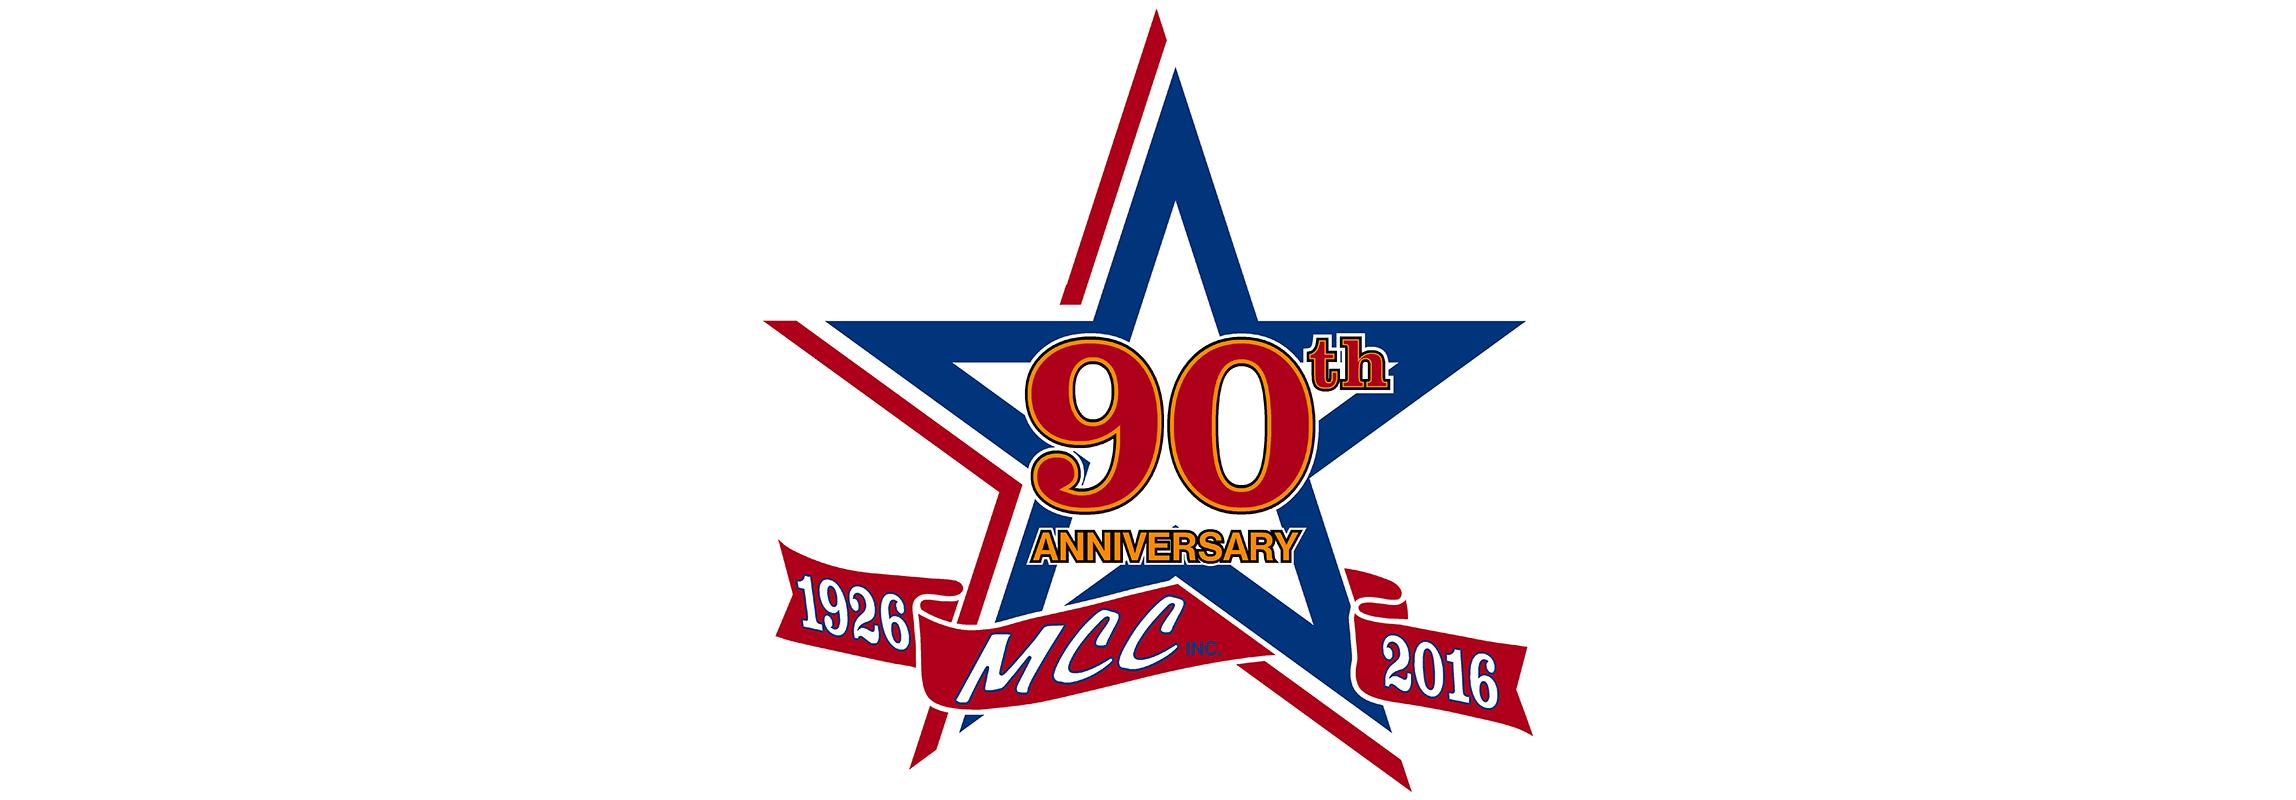 MCC Celebrates 90th Anniversary